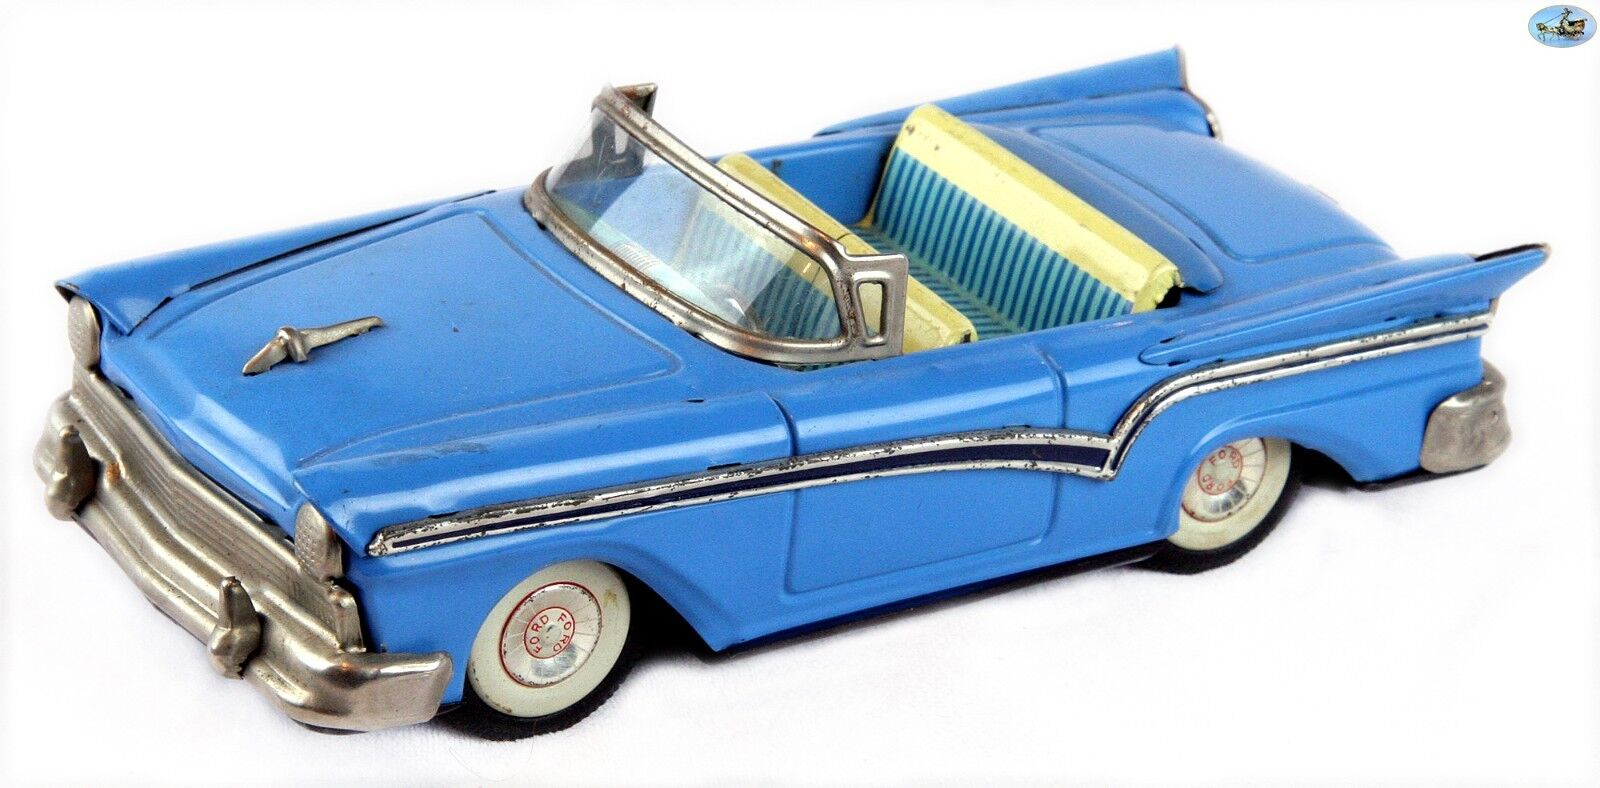 SUPERBE 1957 Vintage JAPAN HAJI TOY FORD FAIRLANE 500 Convertible voiture